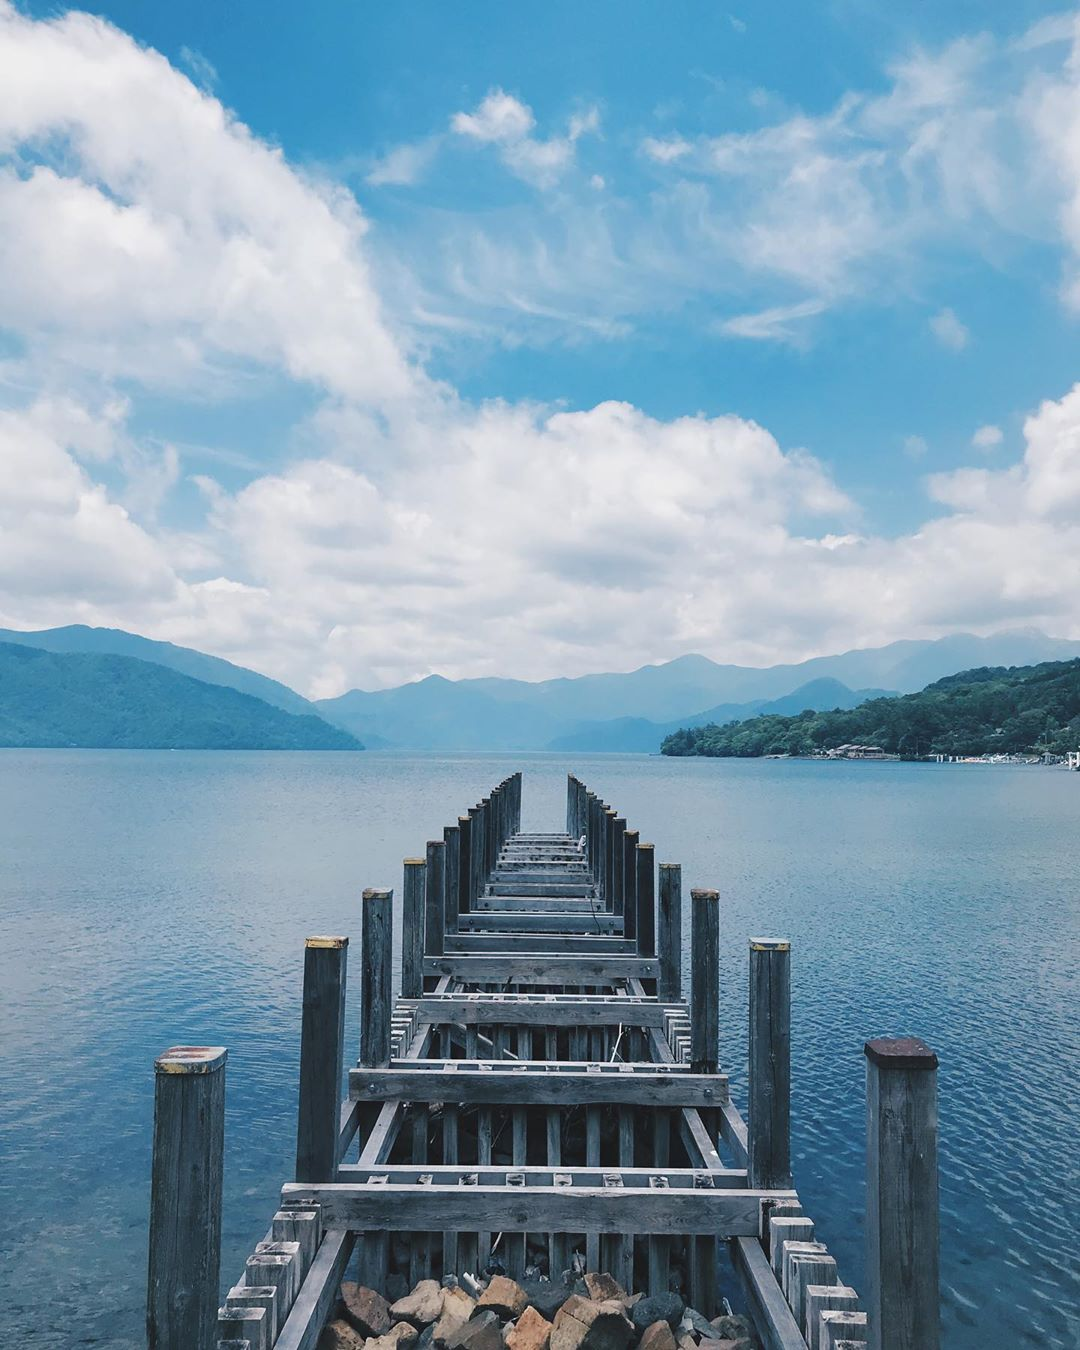 10 Things To Do In Nikko, Japan lake chuzenji